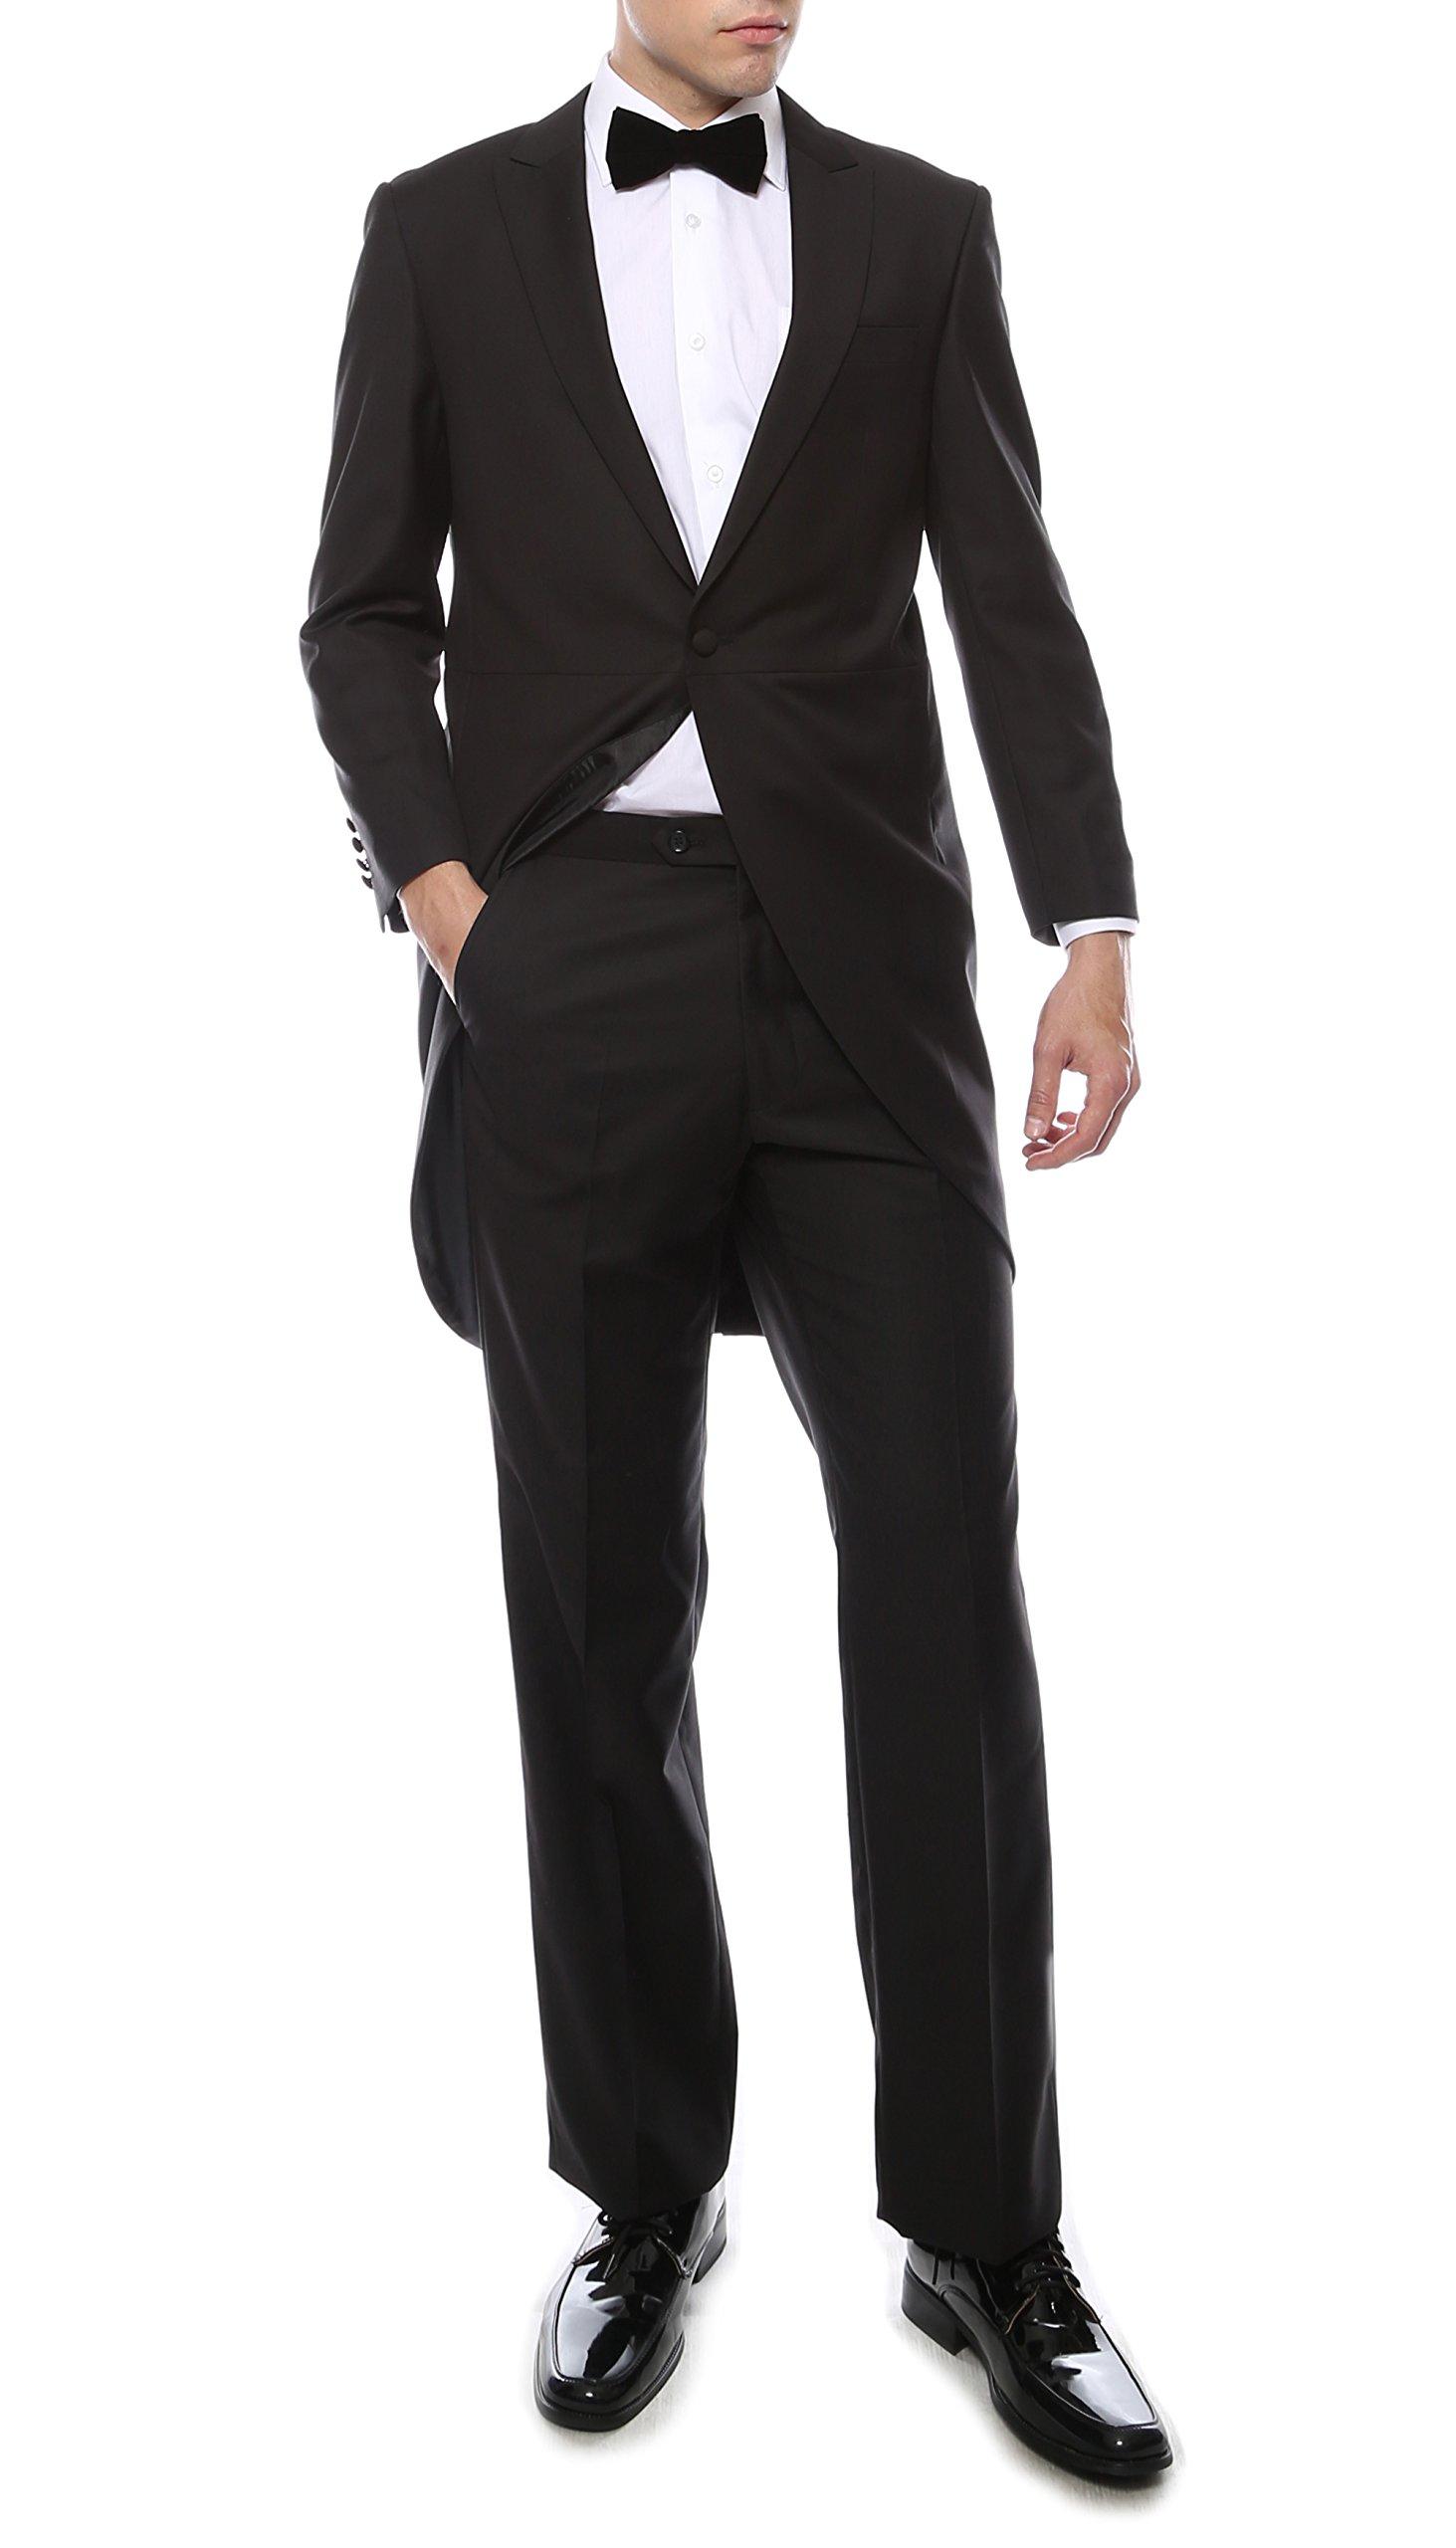 Ferrecci Men's Regular Fit Peak Lapel Black Cutaway Tuxedo Suit with Tux Pants & Tailcoat (36 Regular) by Ferrecci